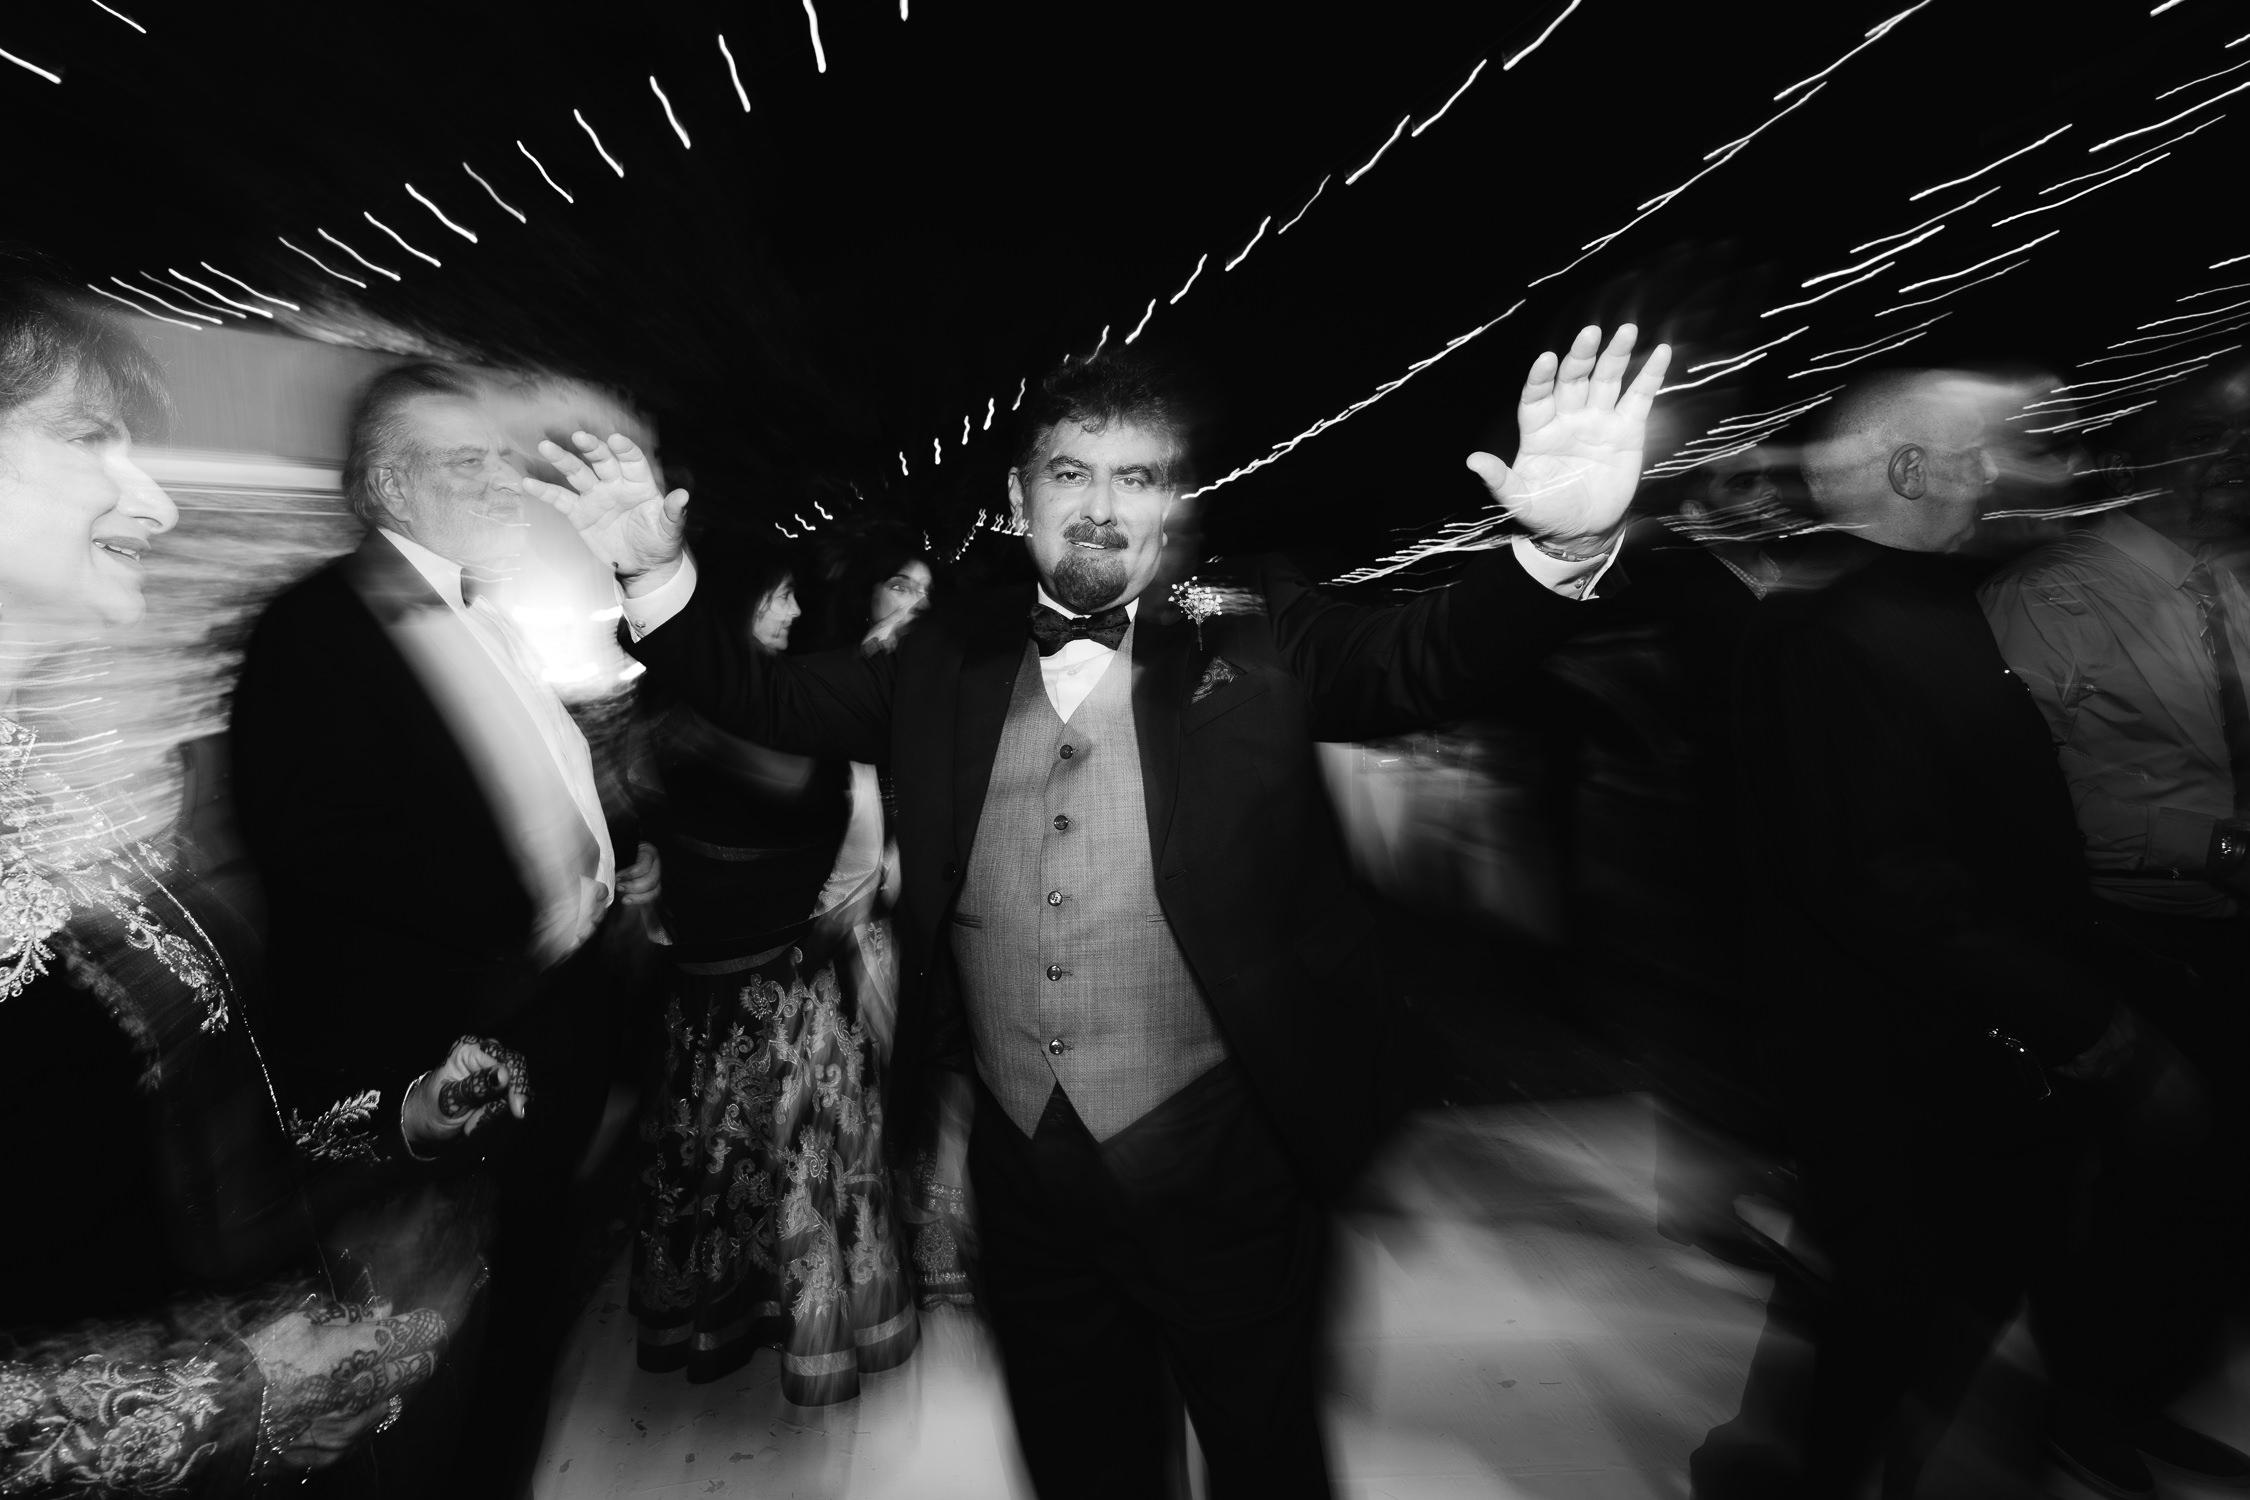 tanzania wedding party flash photography